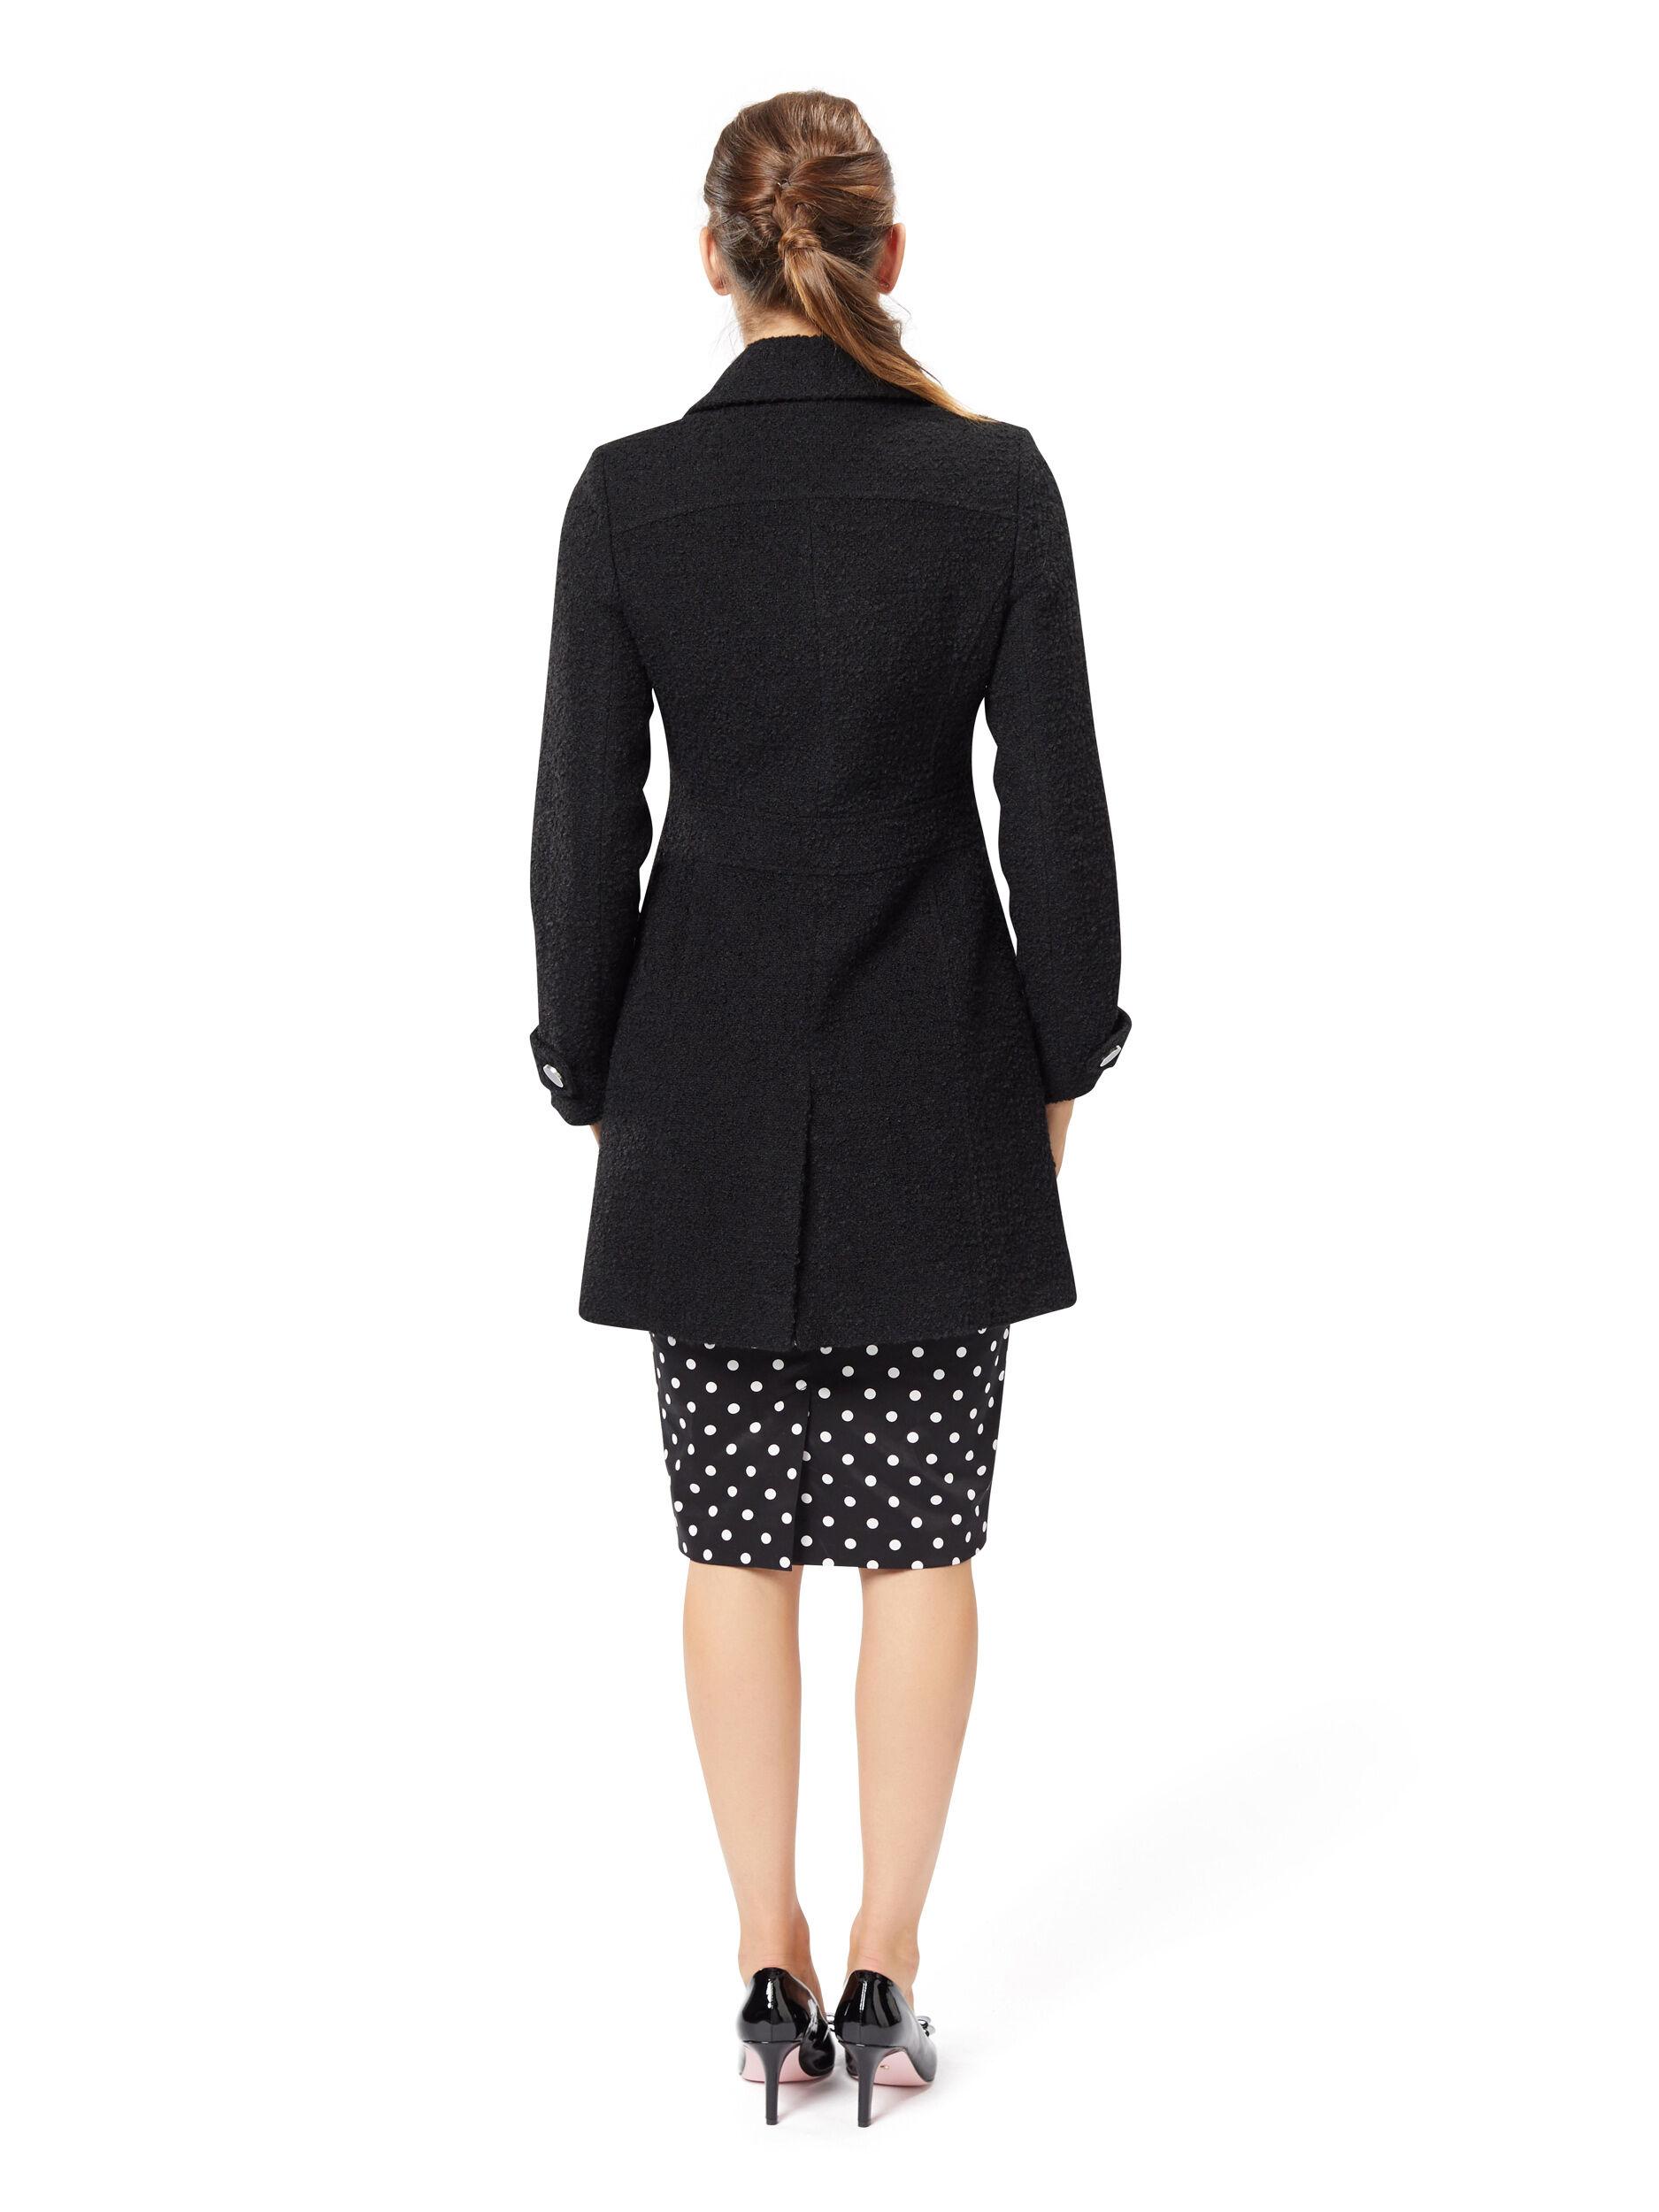 Encanta Rosette Coat